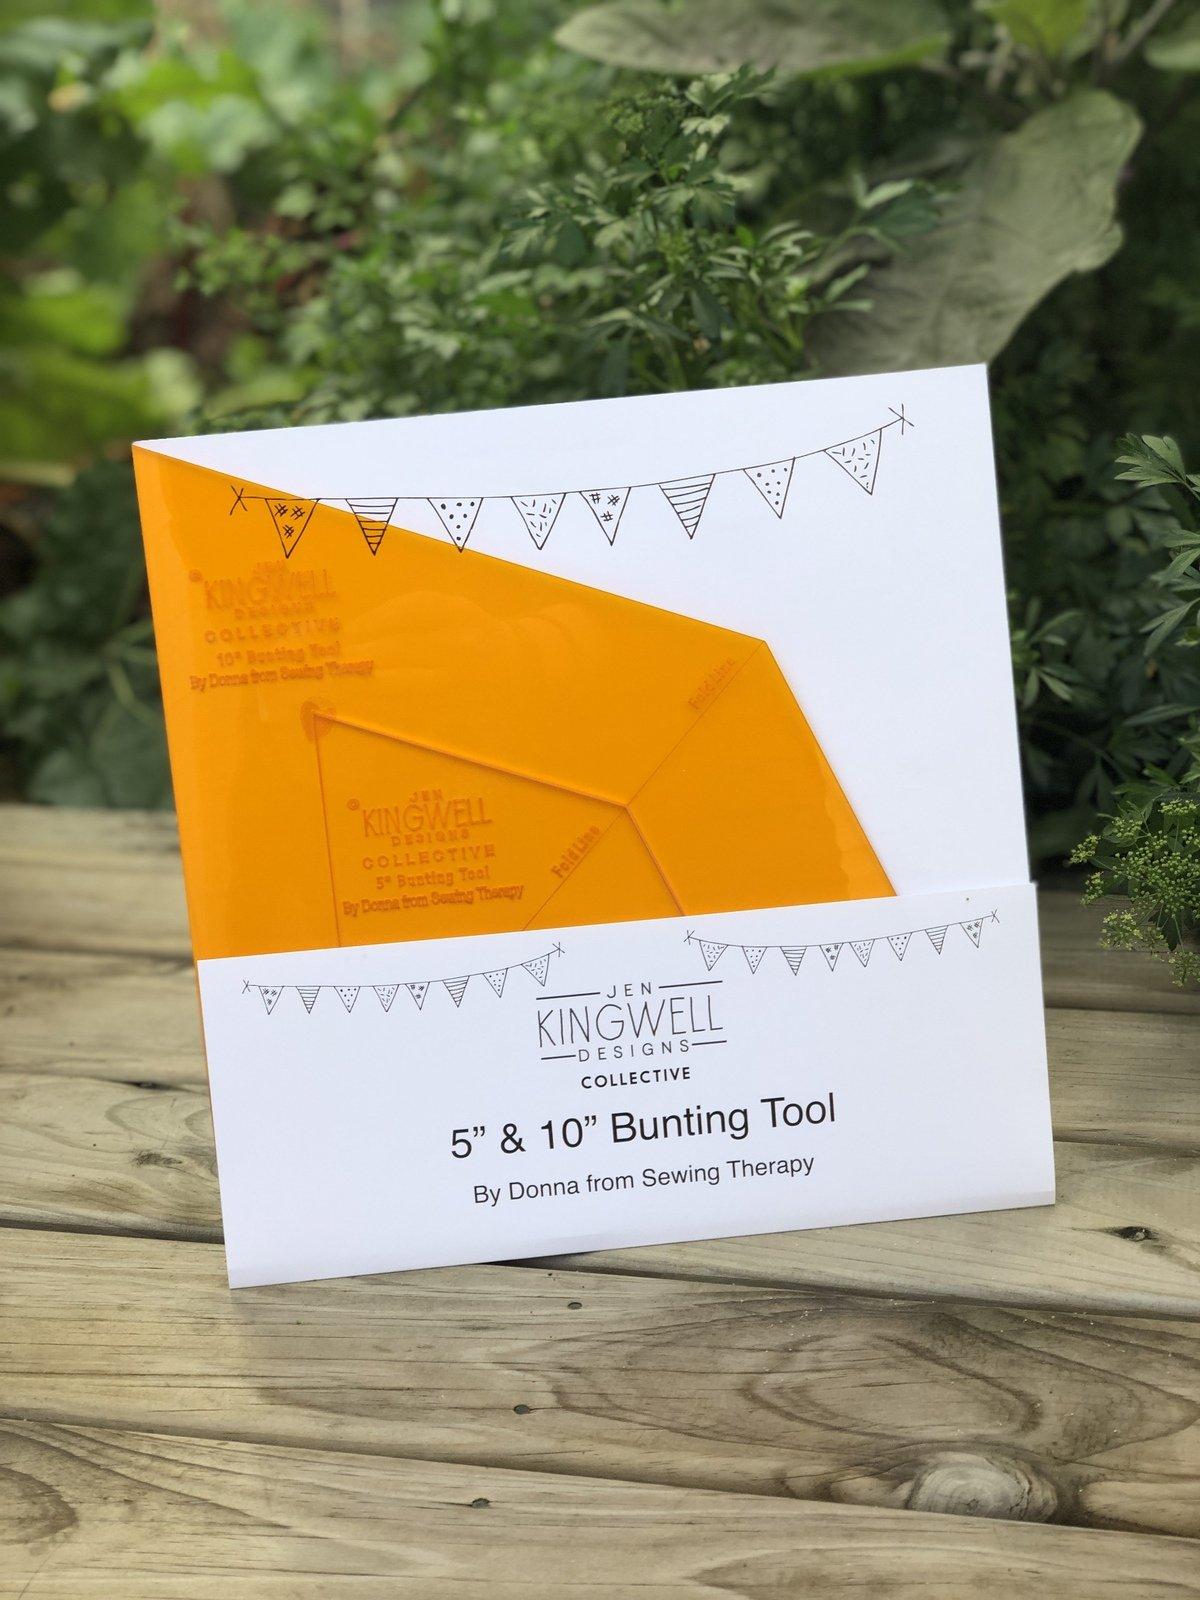 Bunting Tool 5 & 10